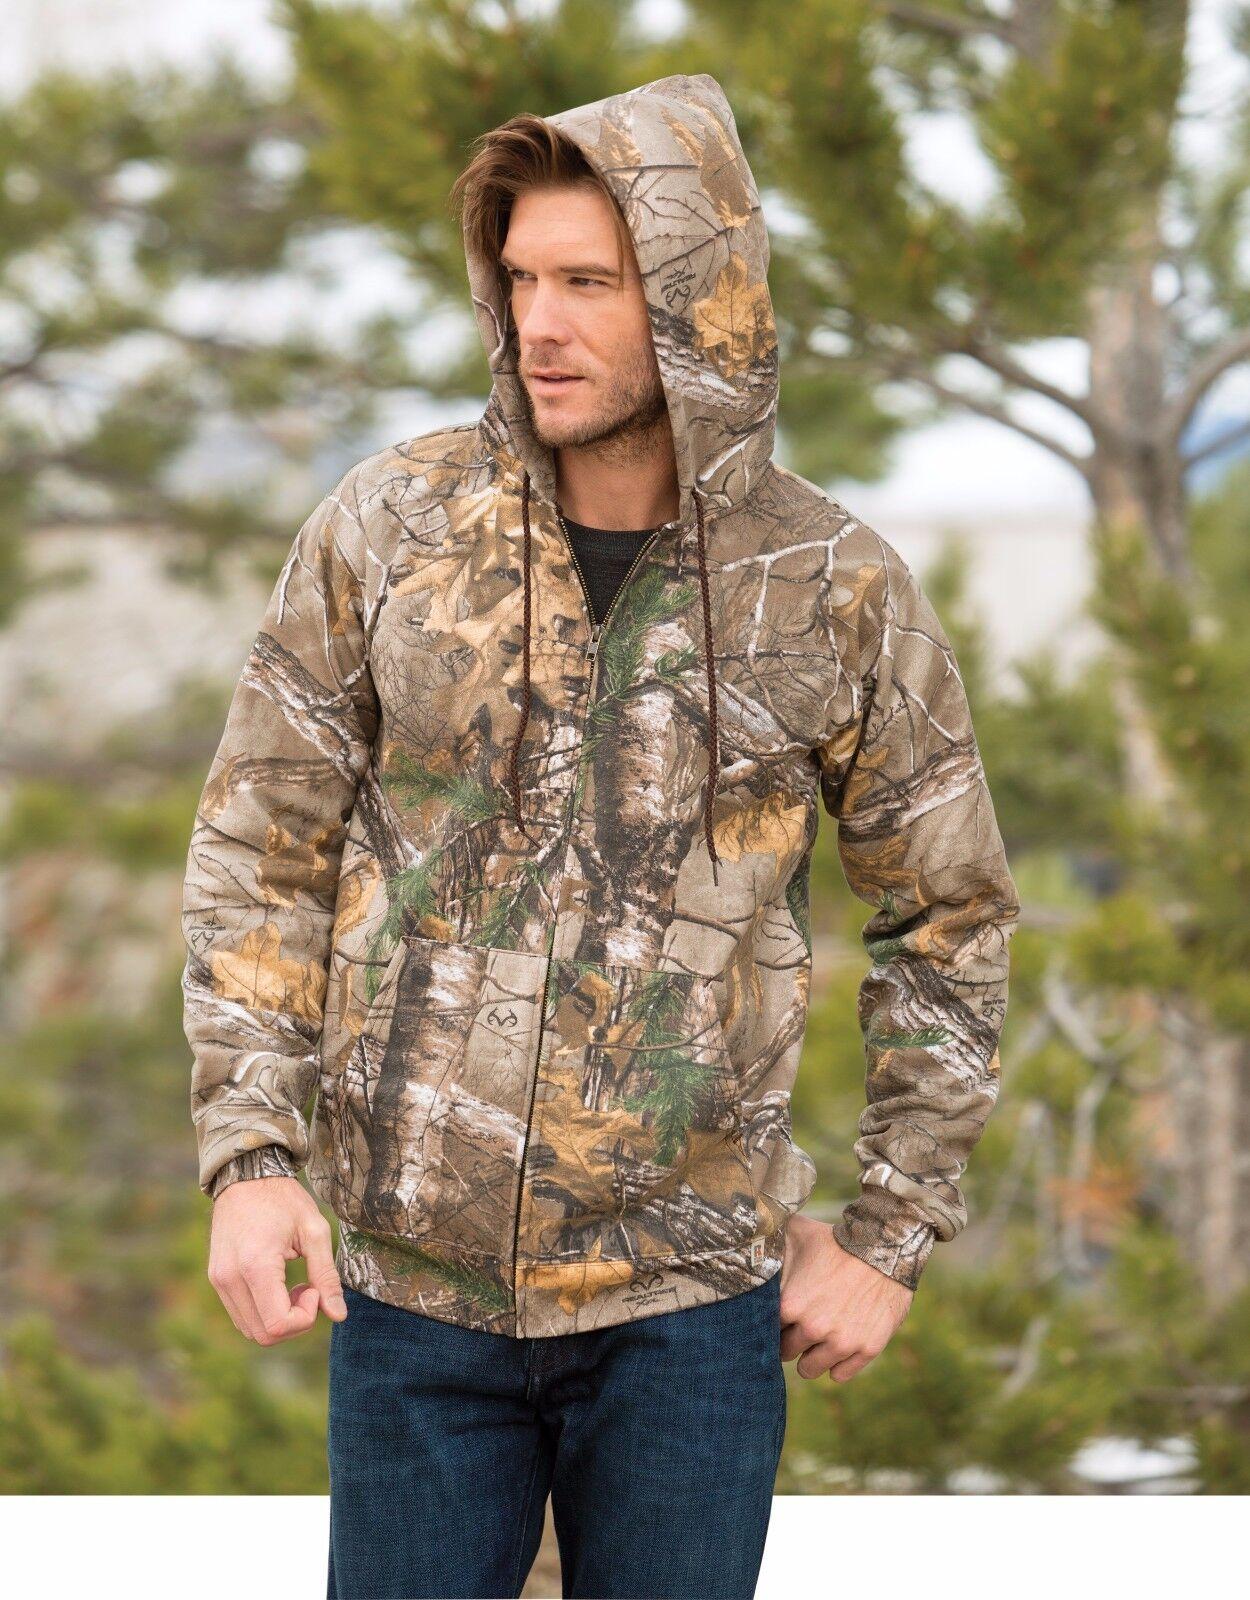 Real Tree Full Zip Camoflauge Hoodie Hunting Outdoor Gun Military M - 3XL